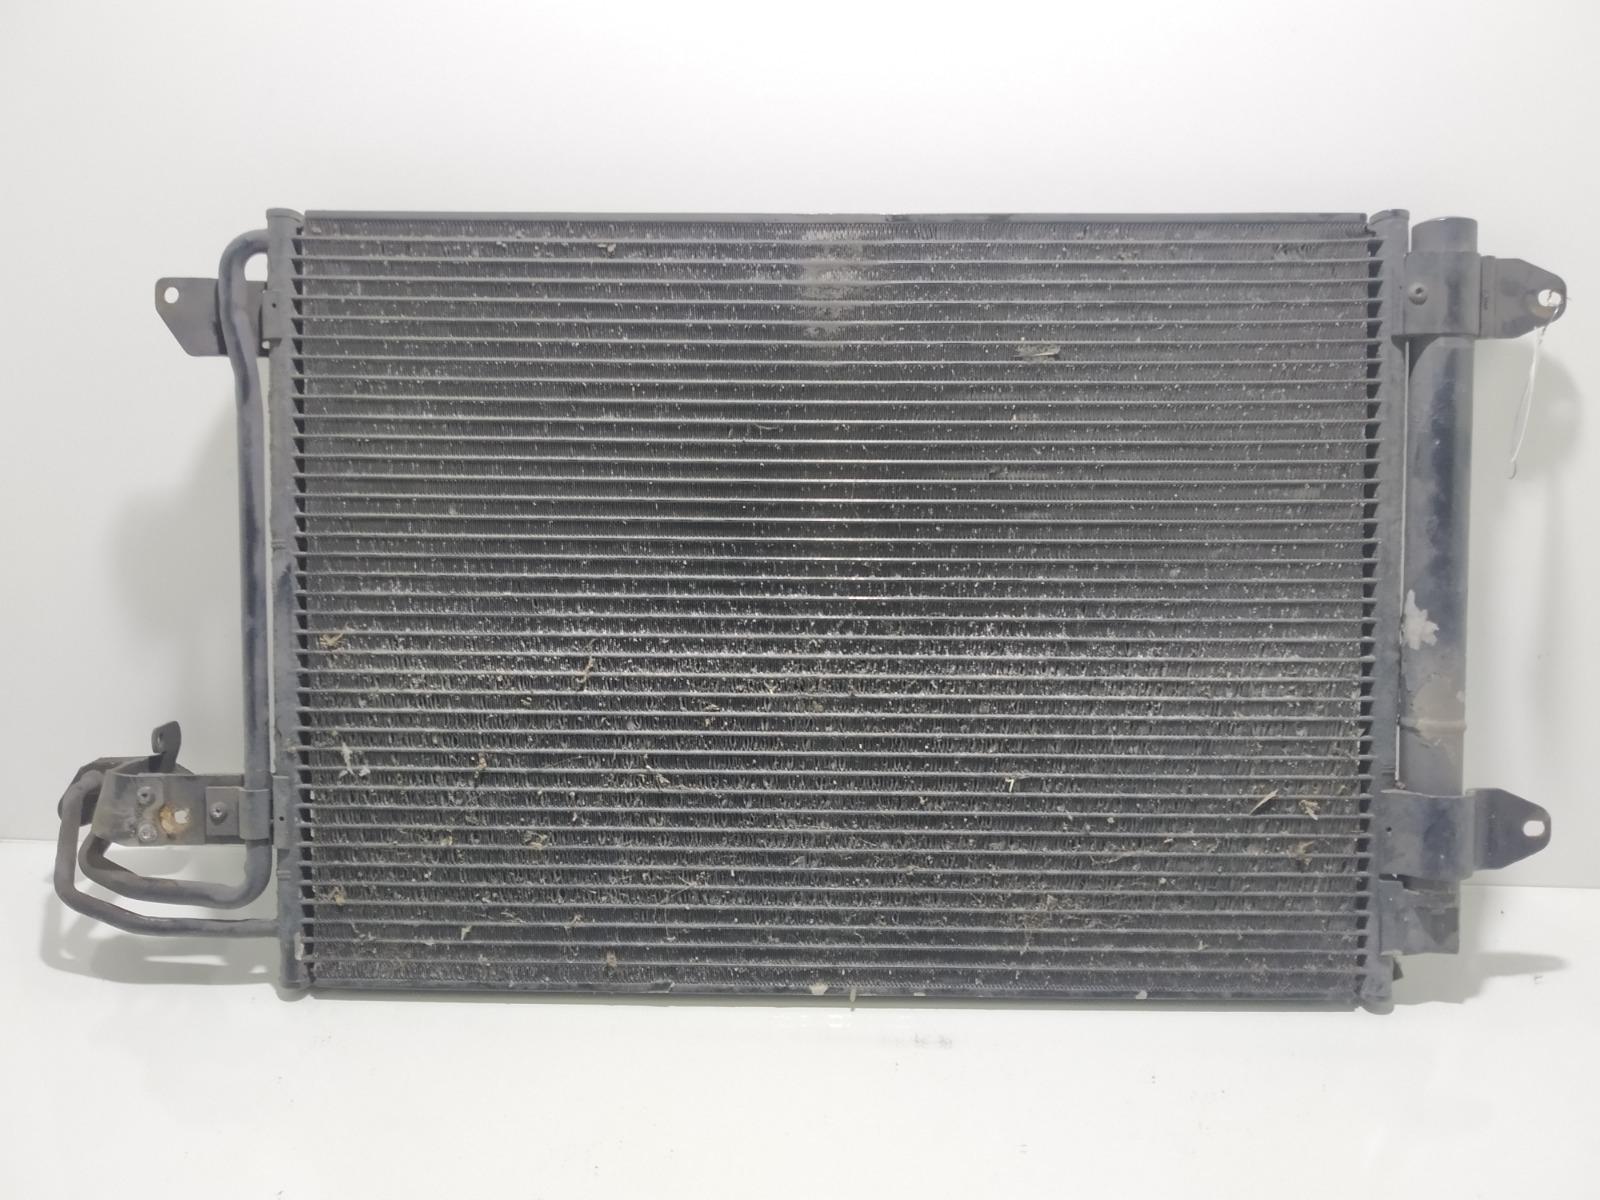 Радиатор кондиционера Volkswagen Golf 5 1.6 FSI 2006 (б/у)